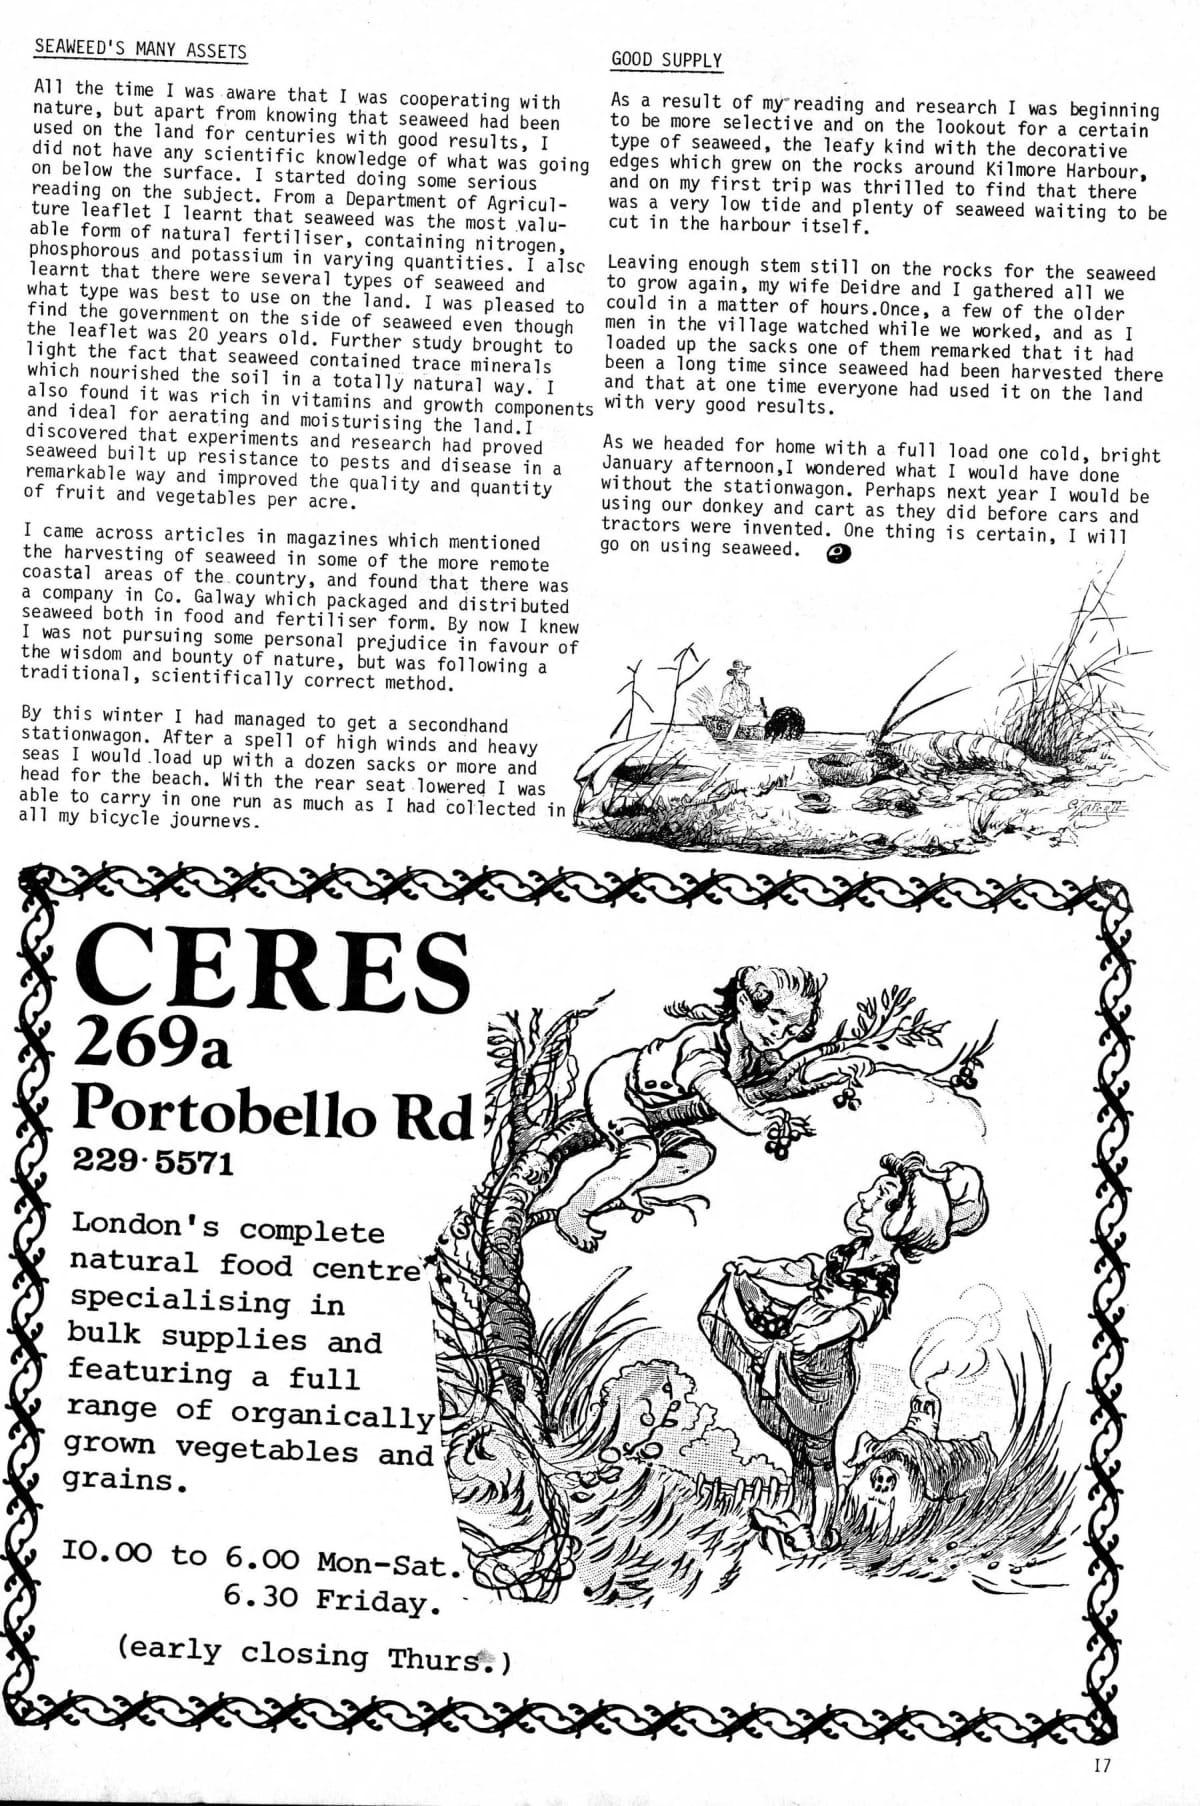 seed-v3-n4-april1974-17.jpg